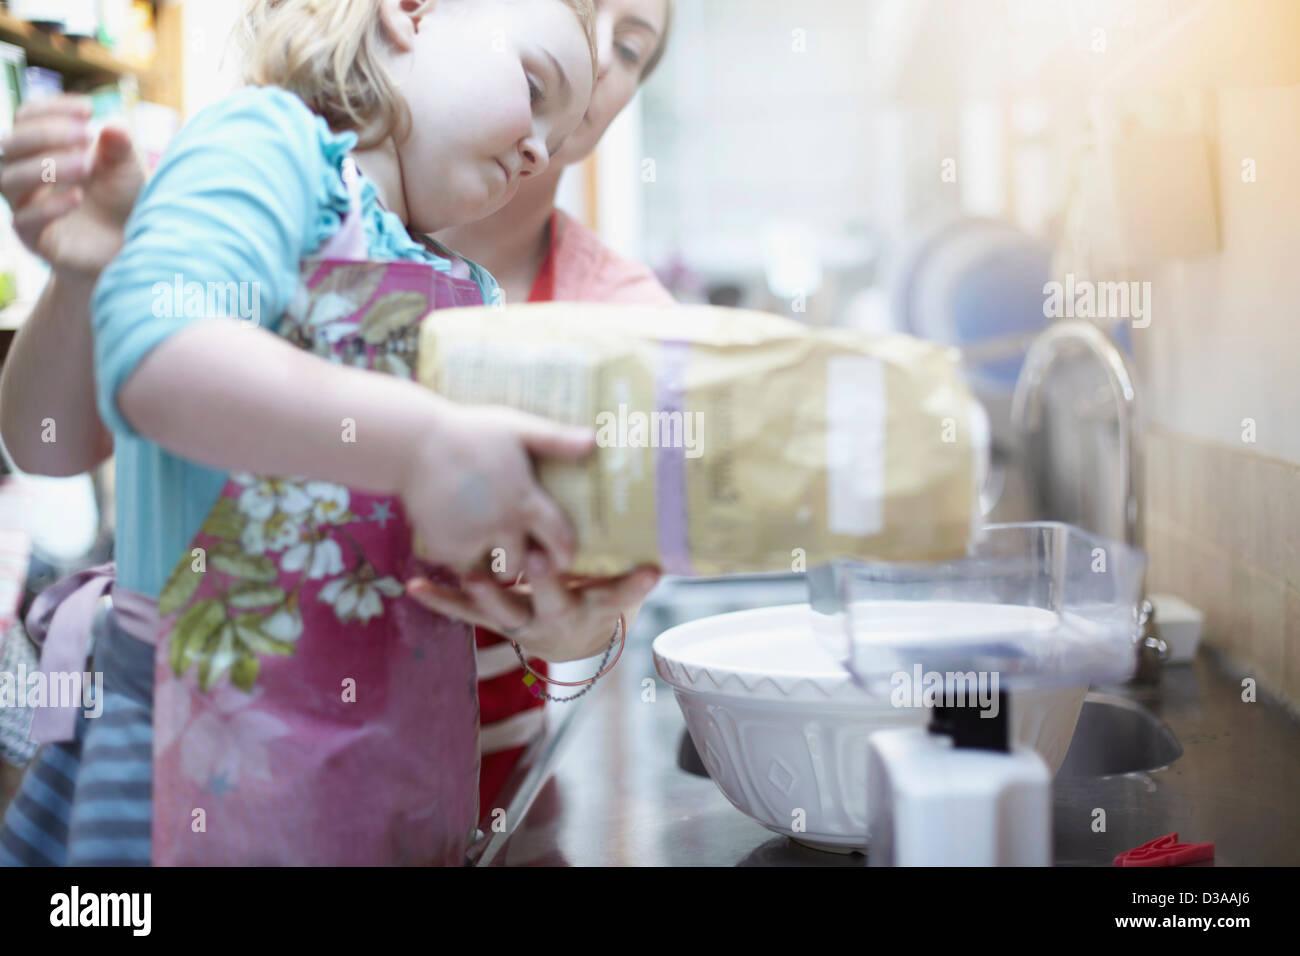 Madre e hija hornear juntos Imagen De Stock